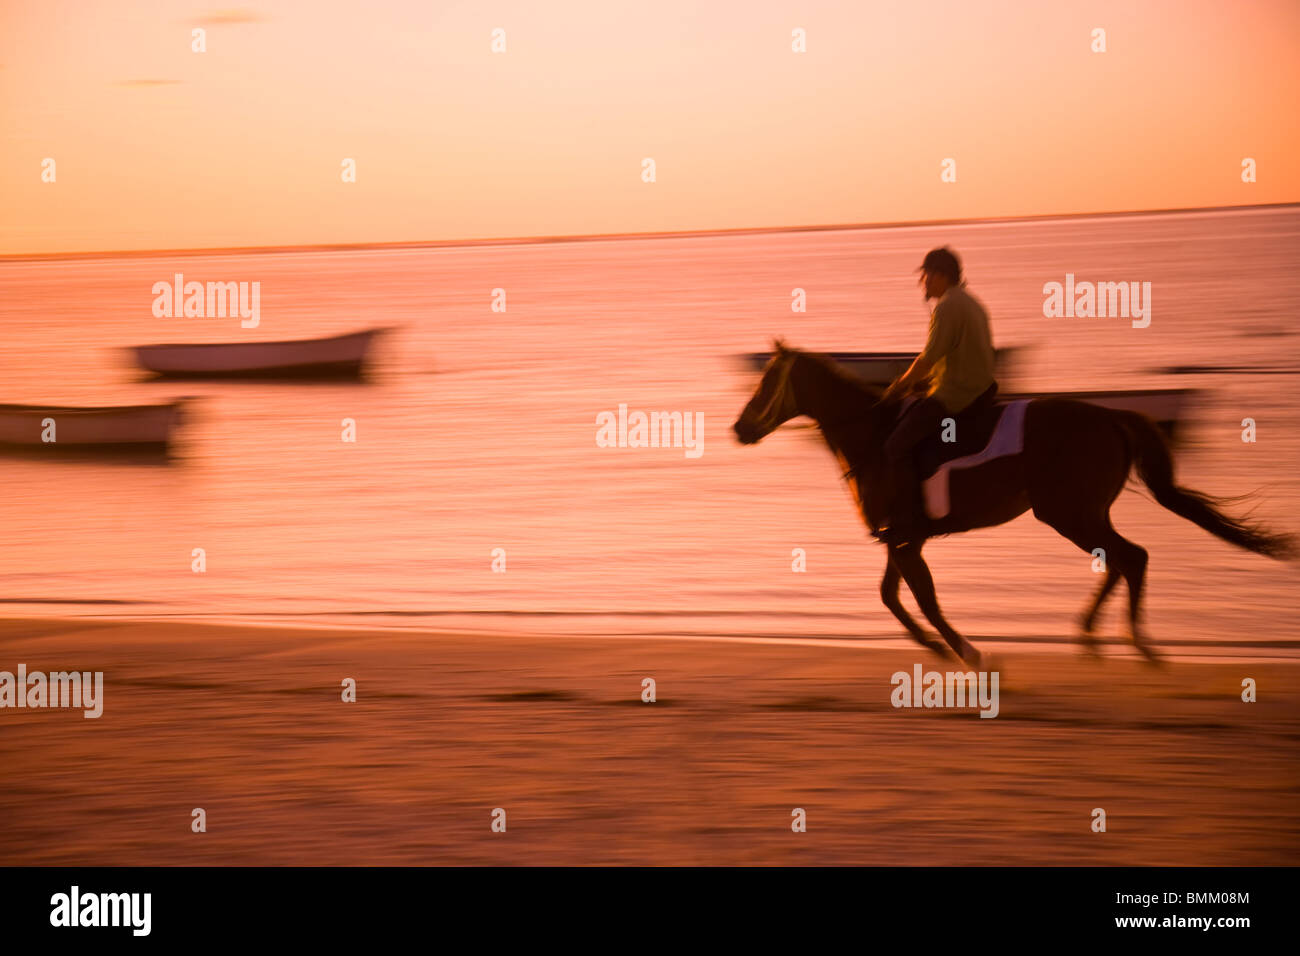 Mauritius Horse Stock Photos Images Alamy Afrika Et Tour Le Morne Horseback Riding English Style Rider At Sunrise Belle Mare Public Beach Southeast